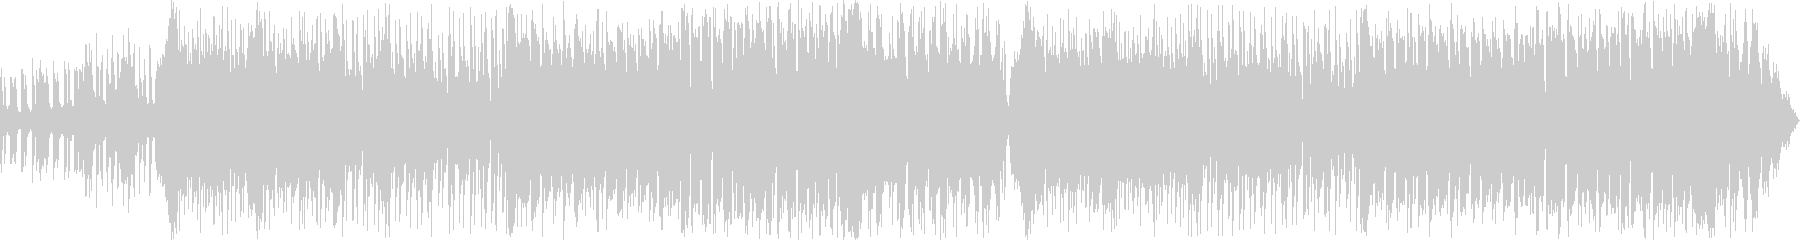 EDM調の激しいバトルシーンの未再生の波形